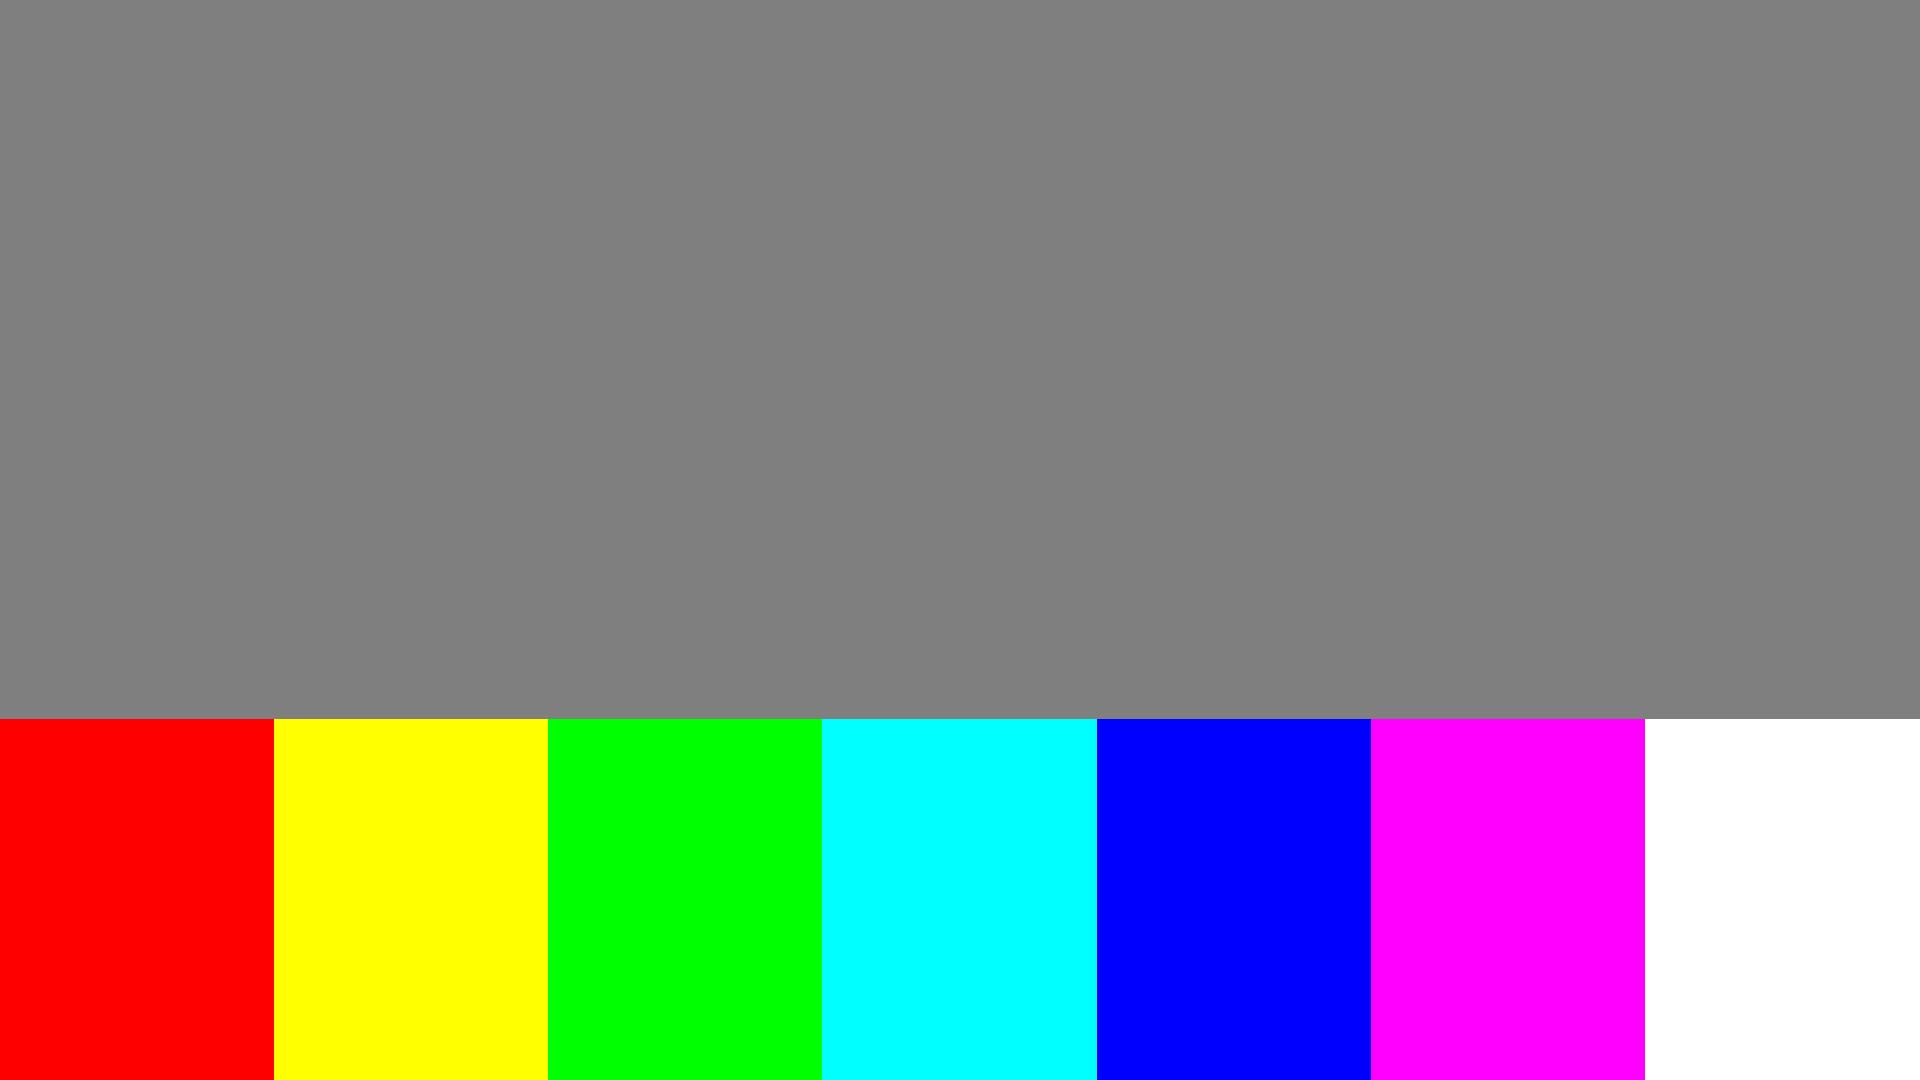 Bottom side color bleed test pattern